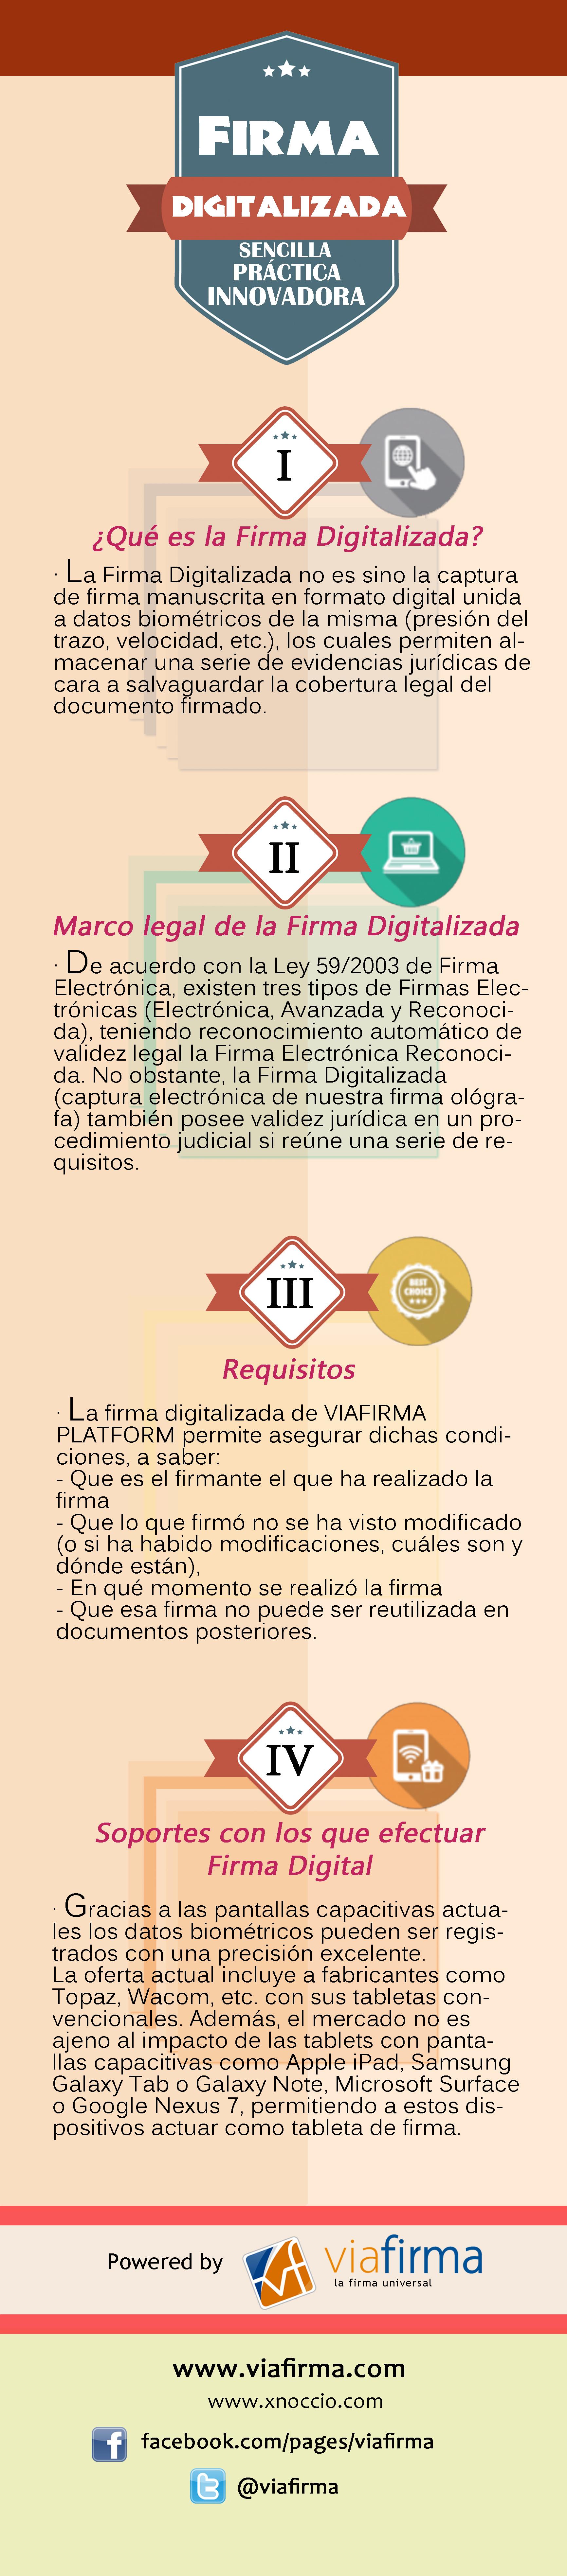 Infografia FirmaDigitalizada Viafirma